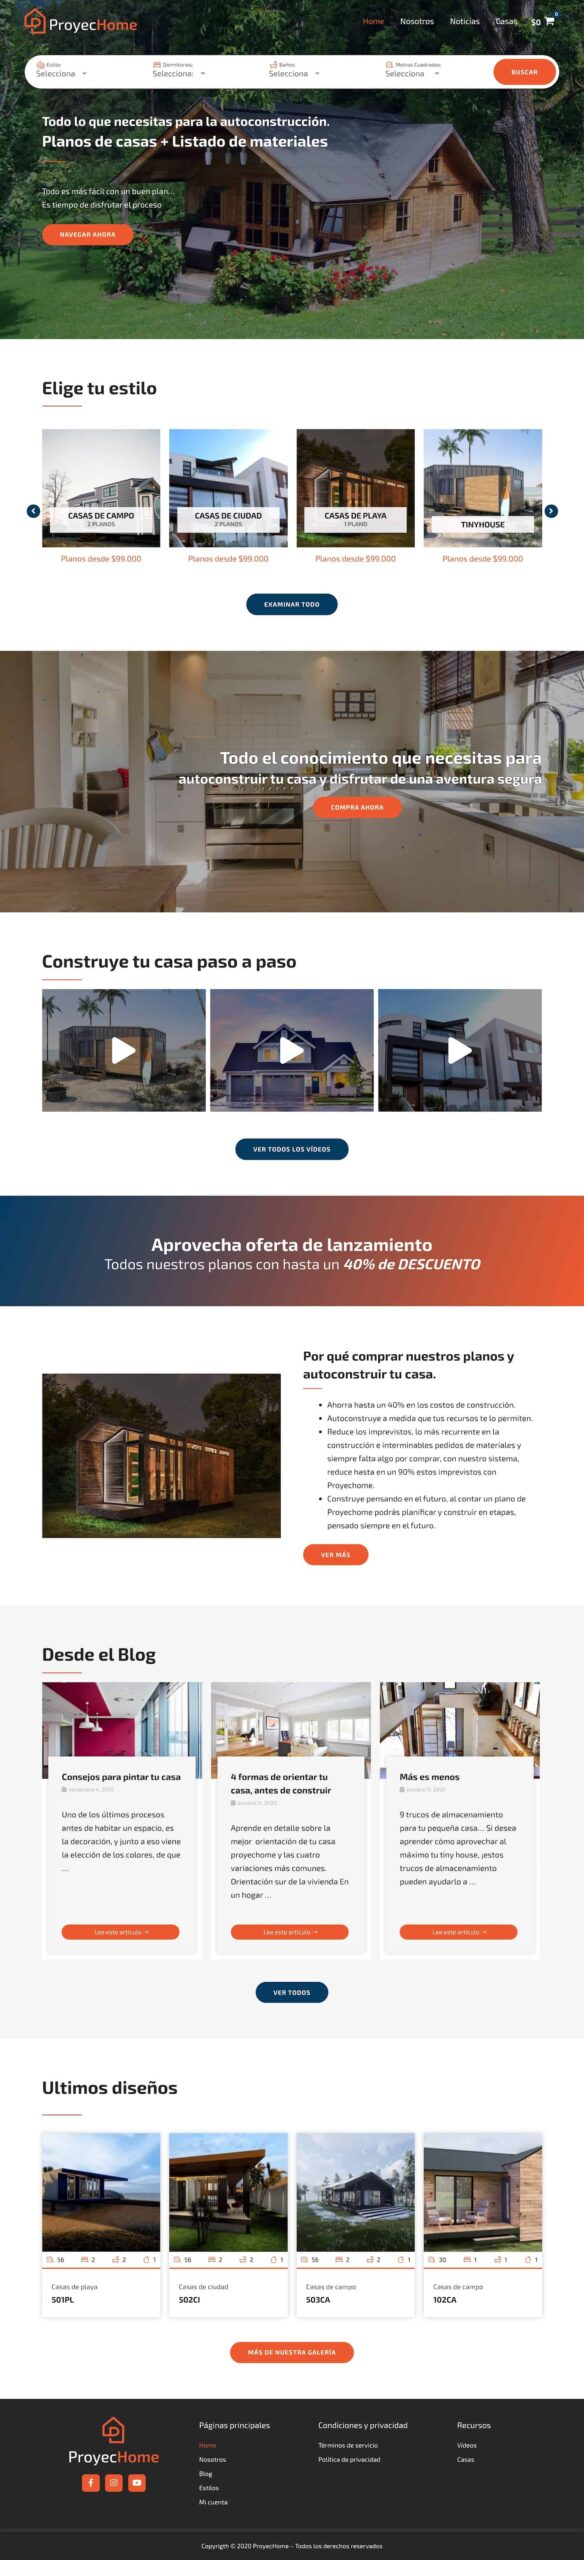 sondys online marketing web design web development houston proyechome.com